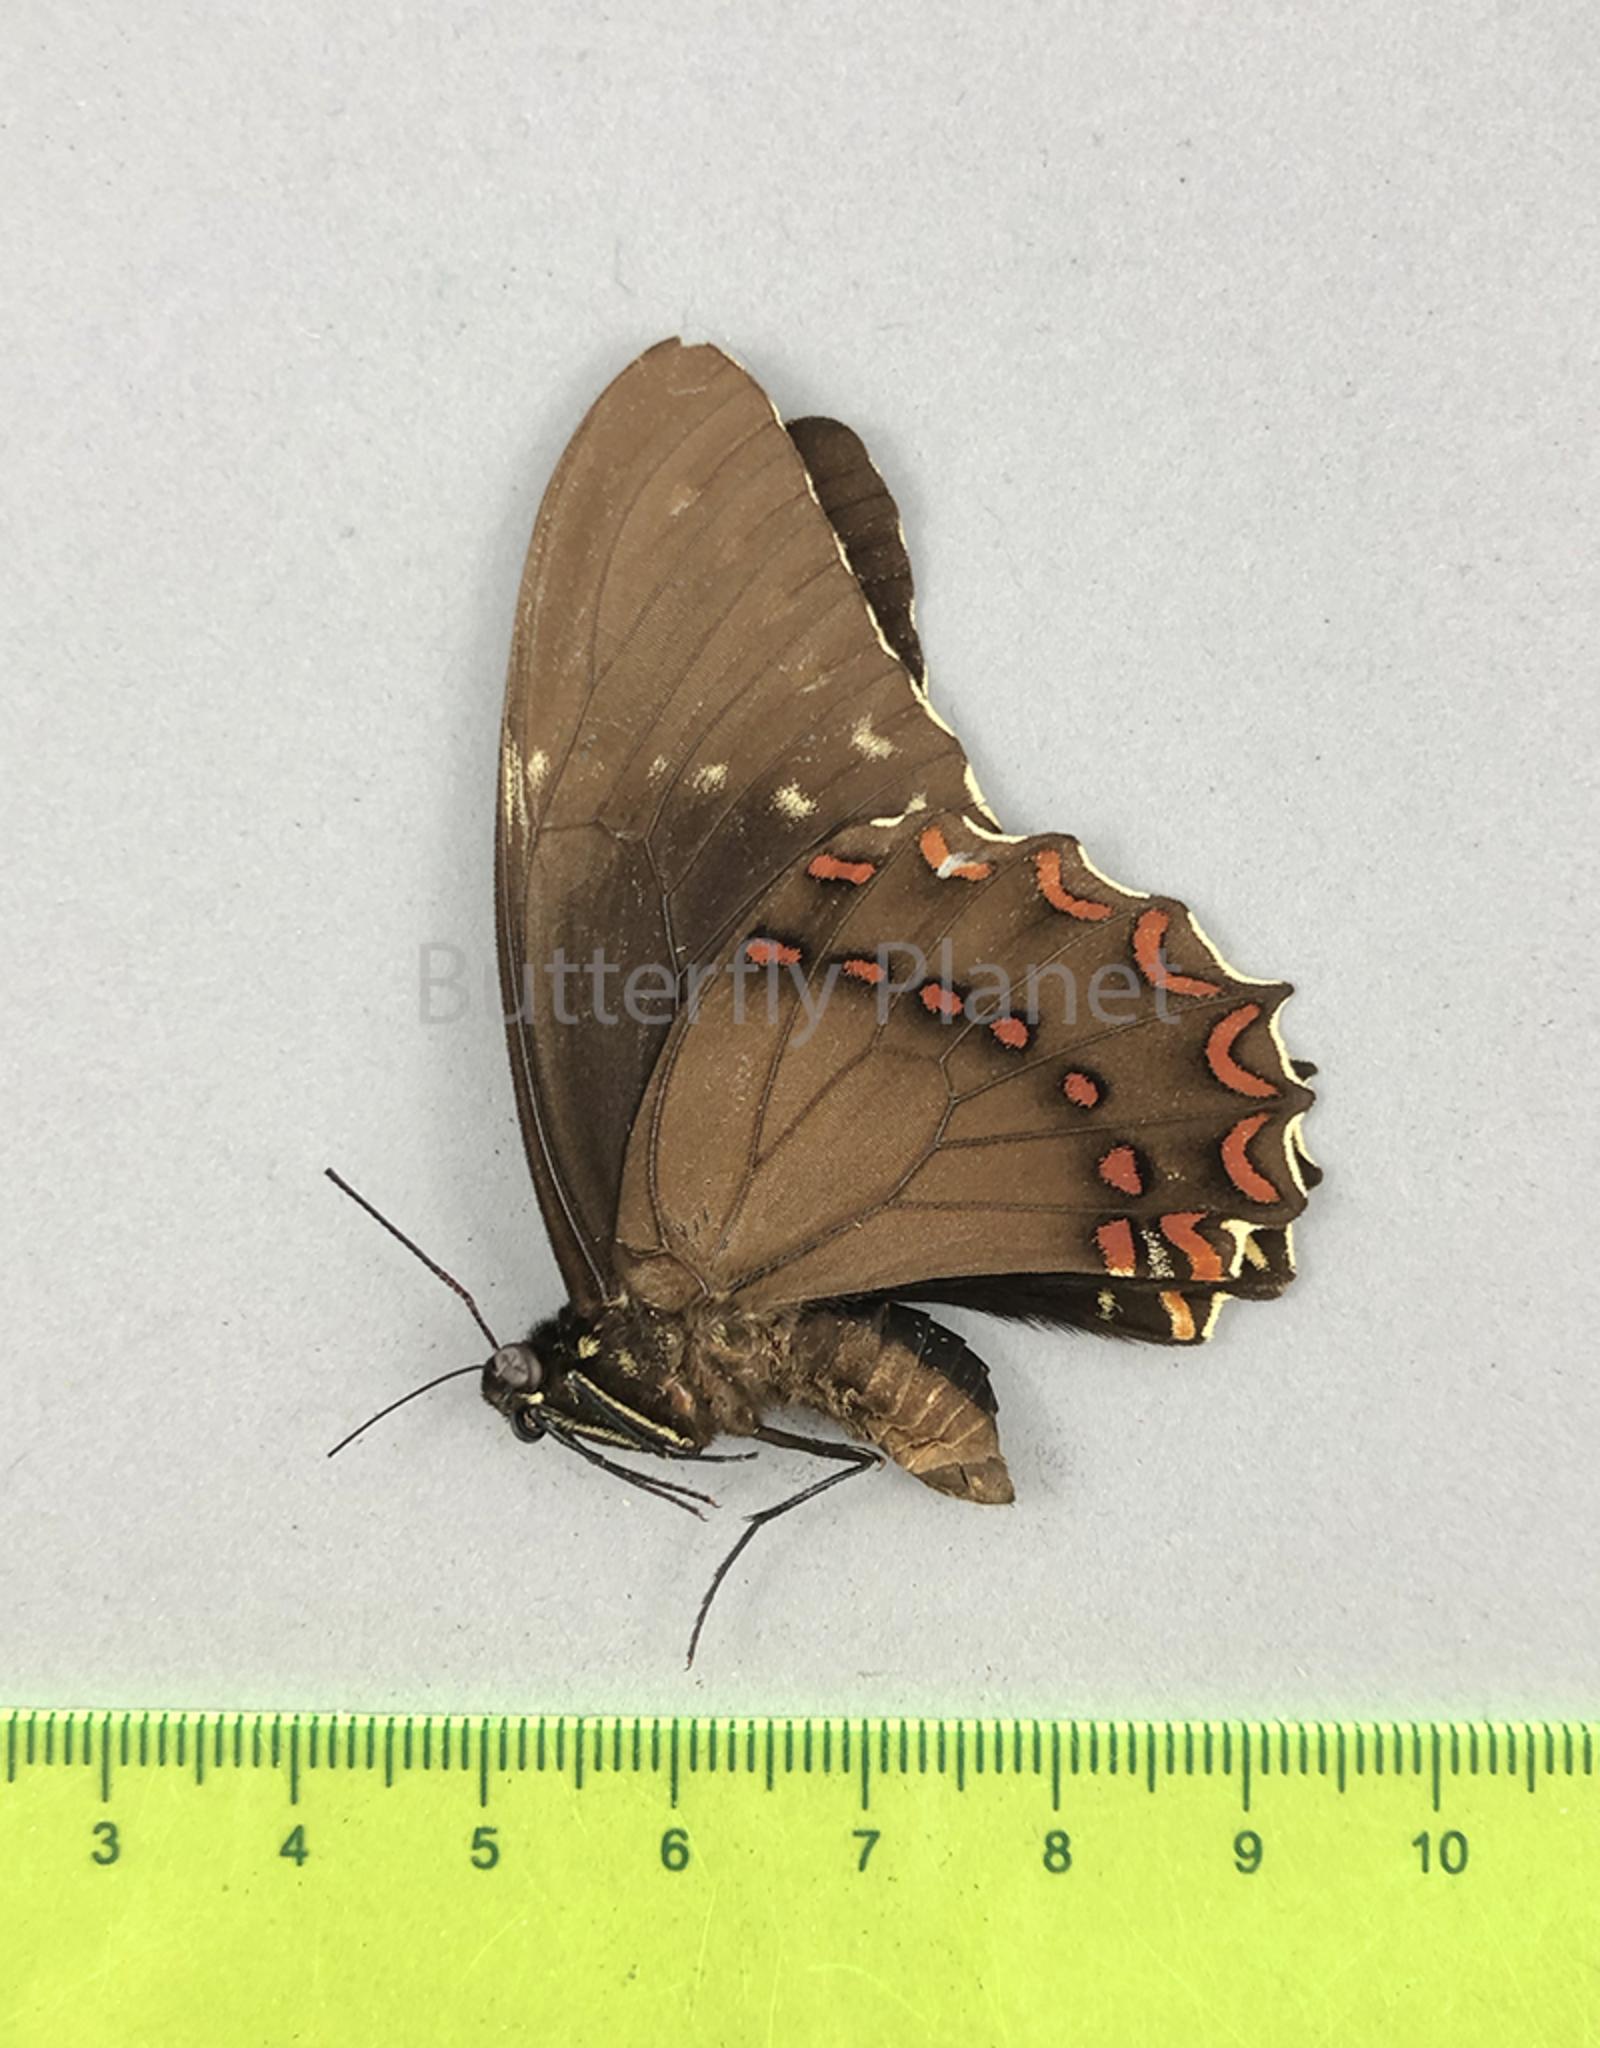 Pterourus victorinus victorinus  M A1- Morelos State, Mexico